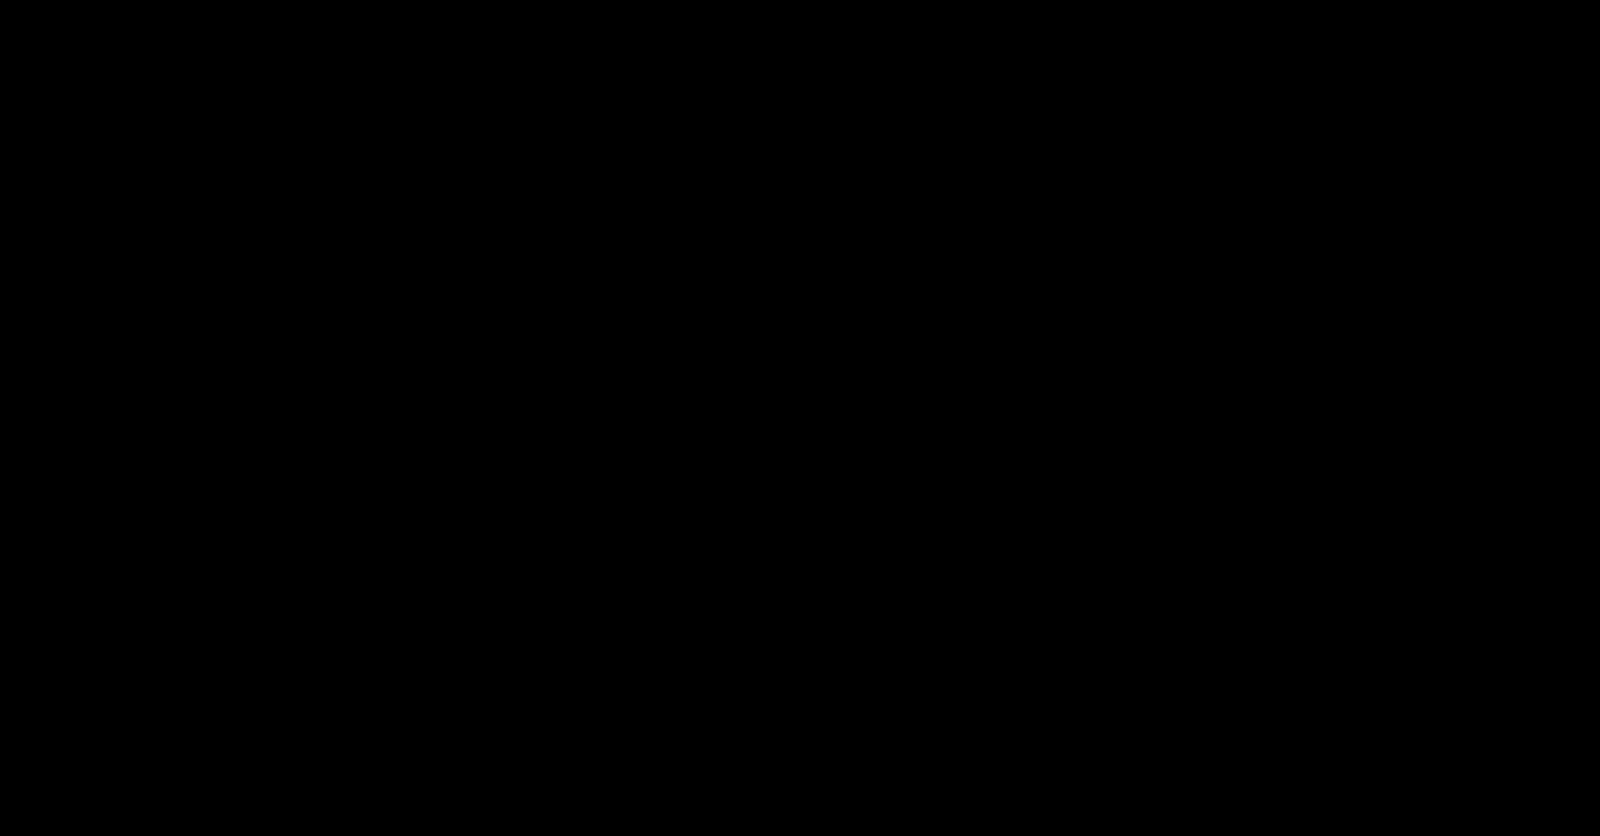 Batman Signal Template Luxury Batman Logo Free Transparent Png Logos